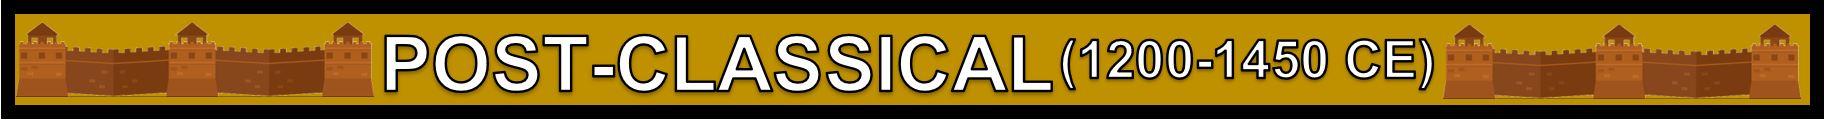 POST CLASSICAL BANNER FOR NEW FREEMANPEDIA 2019.JPG